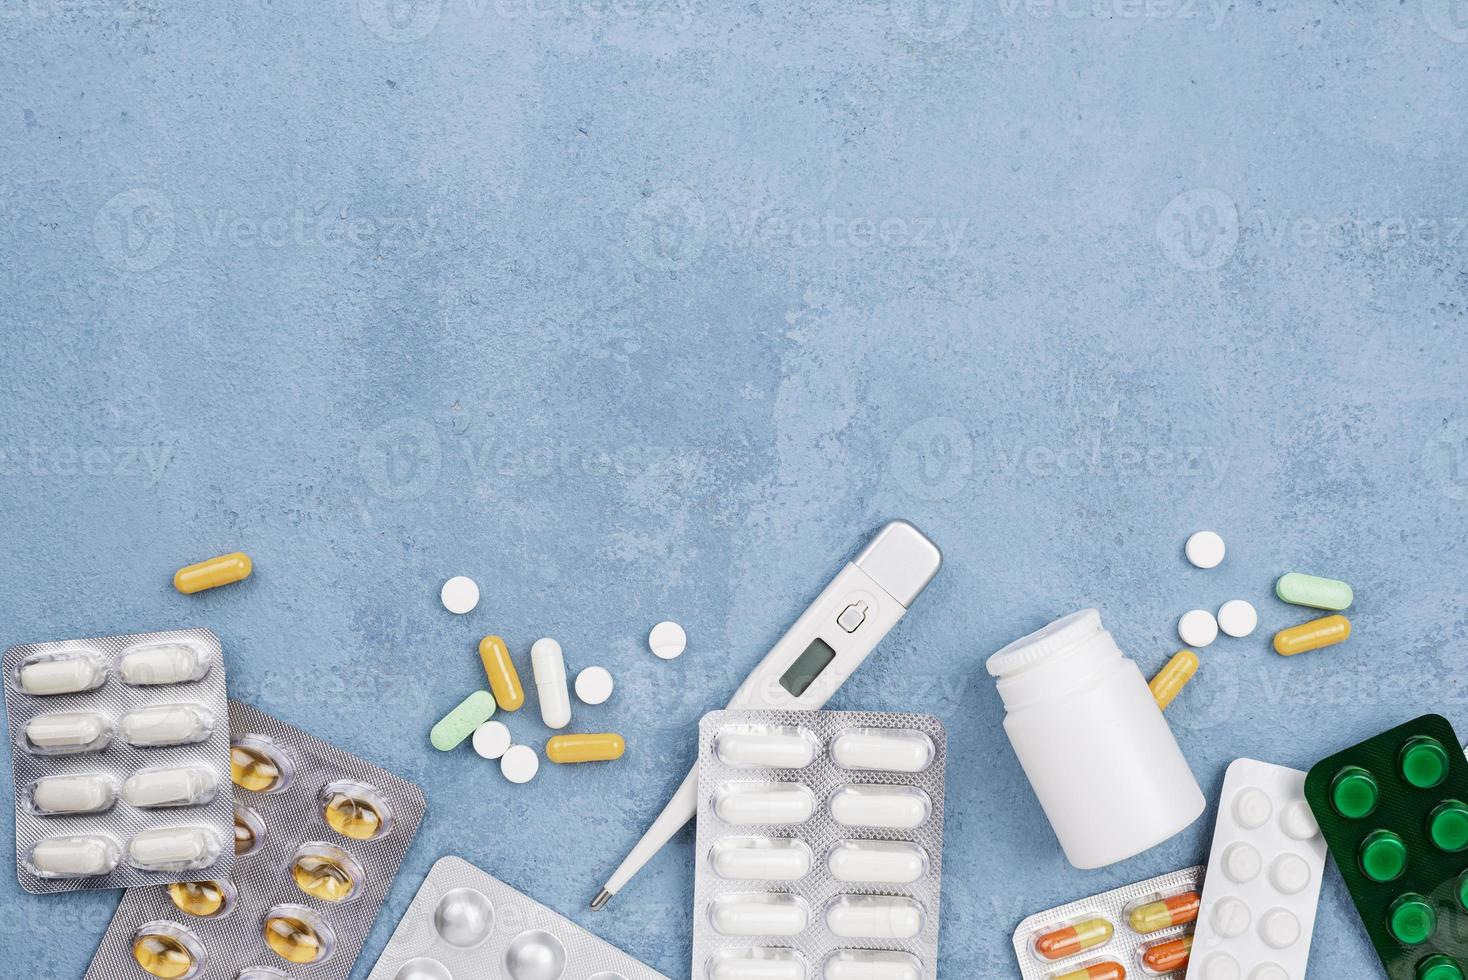 plat leggen medische elementensamenstelling op blauwe achtergrond foto